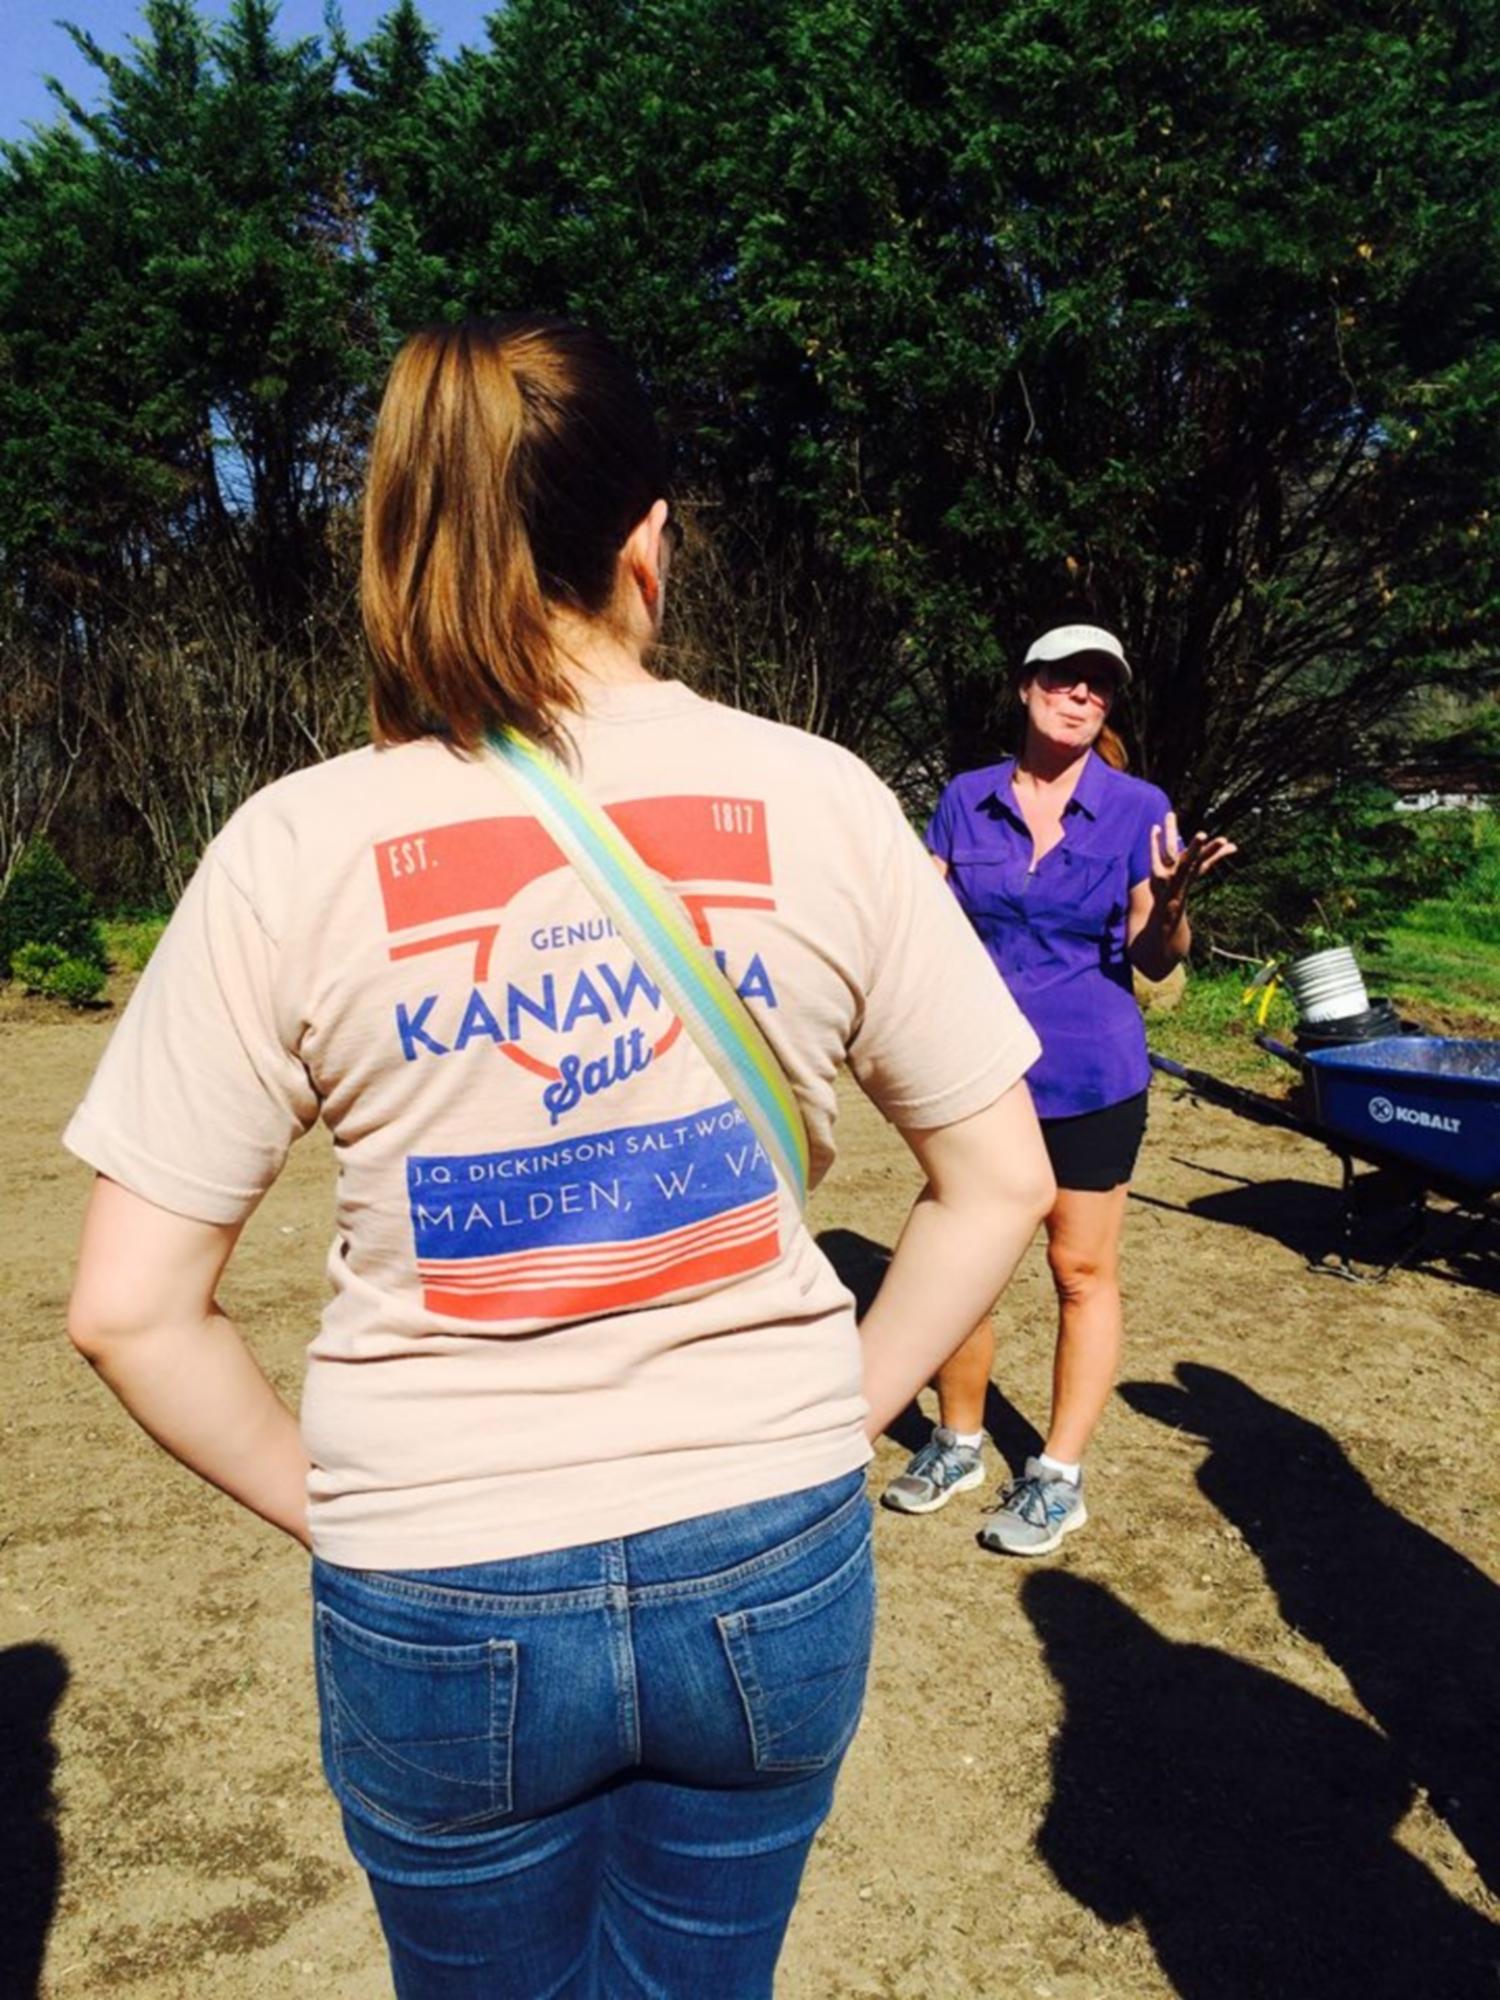 KanawhaSaltTShirt.jpg